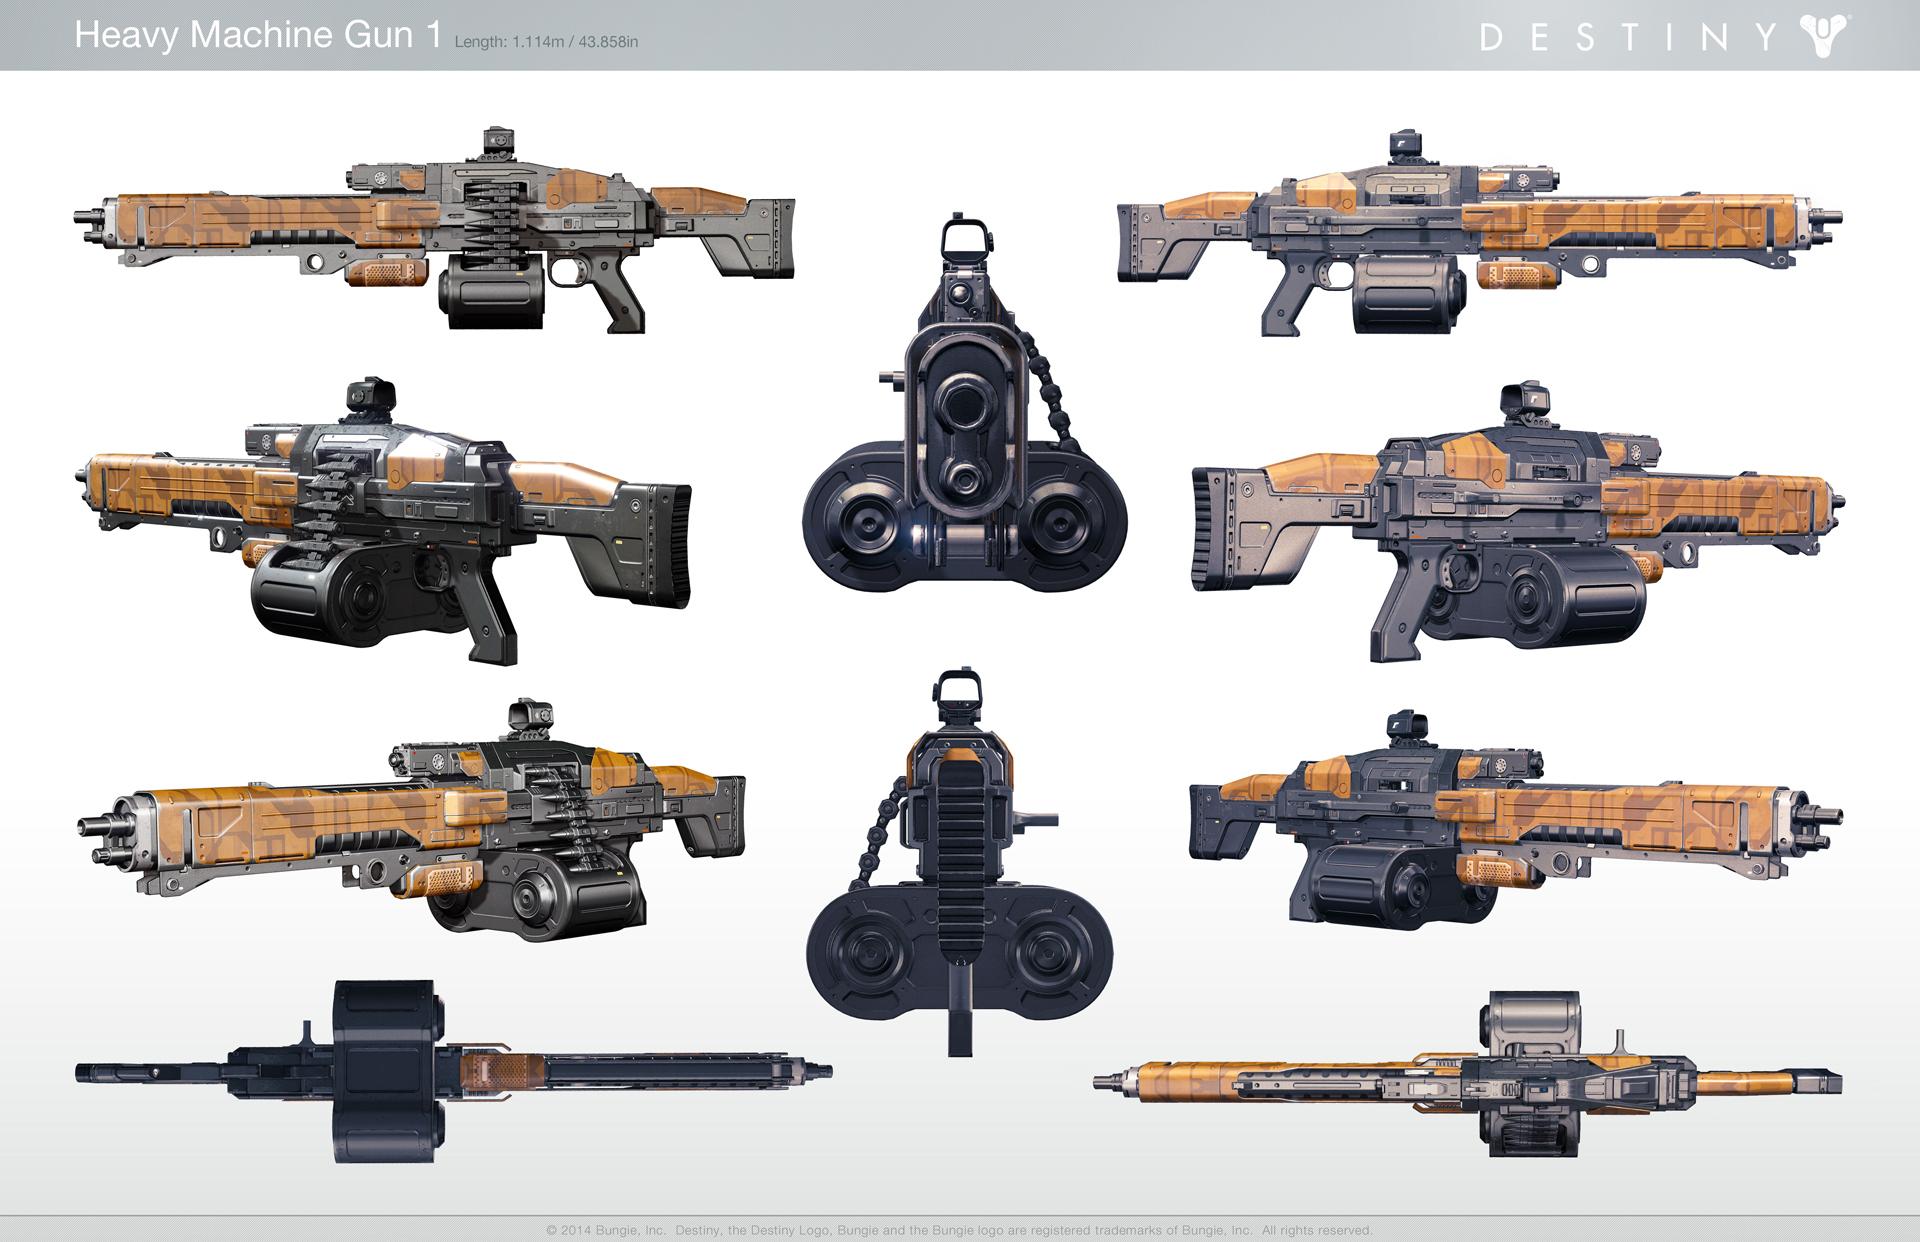 Destiny Heavy Machine Gun wallpaper 1920x1242